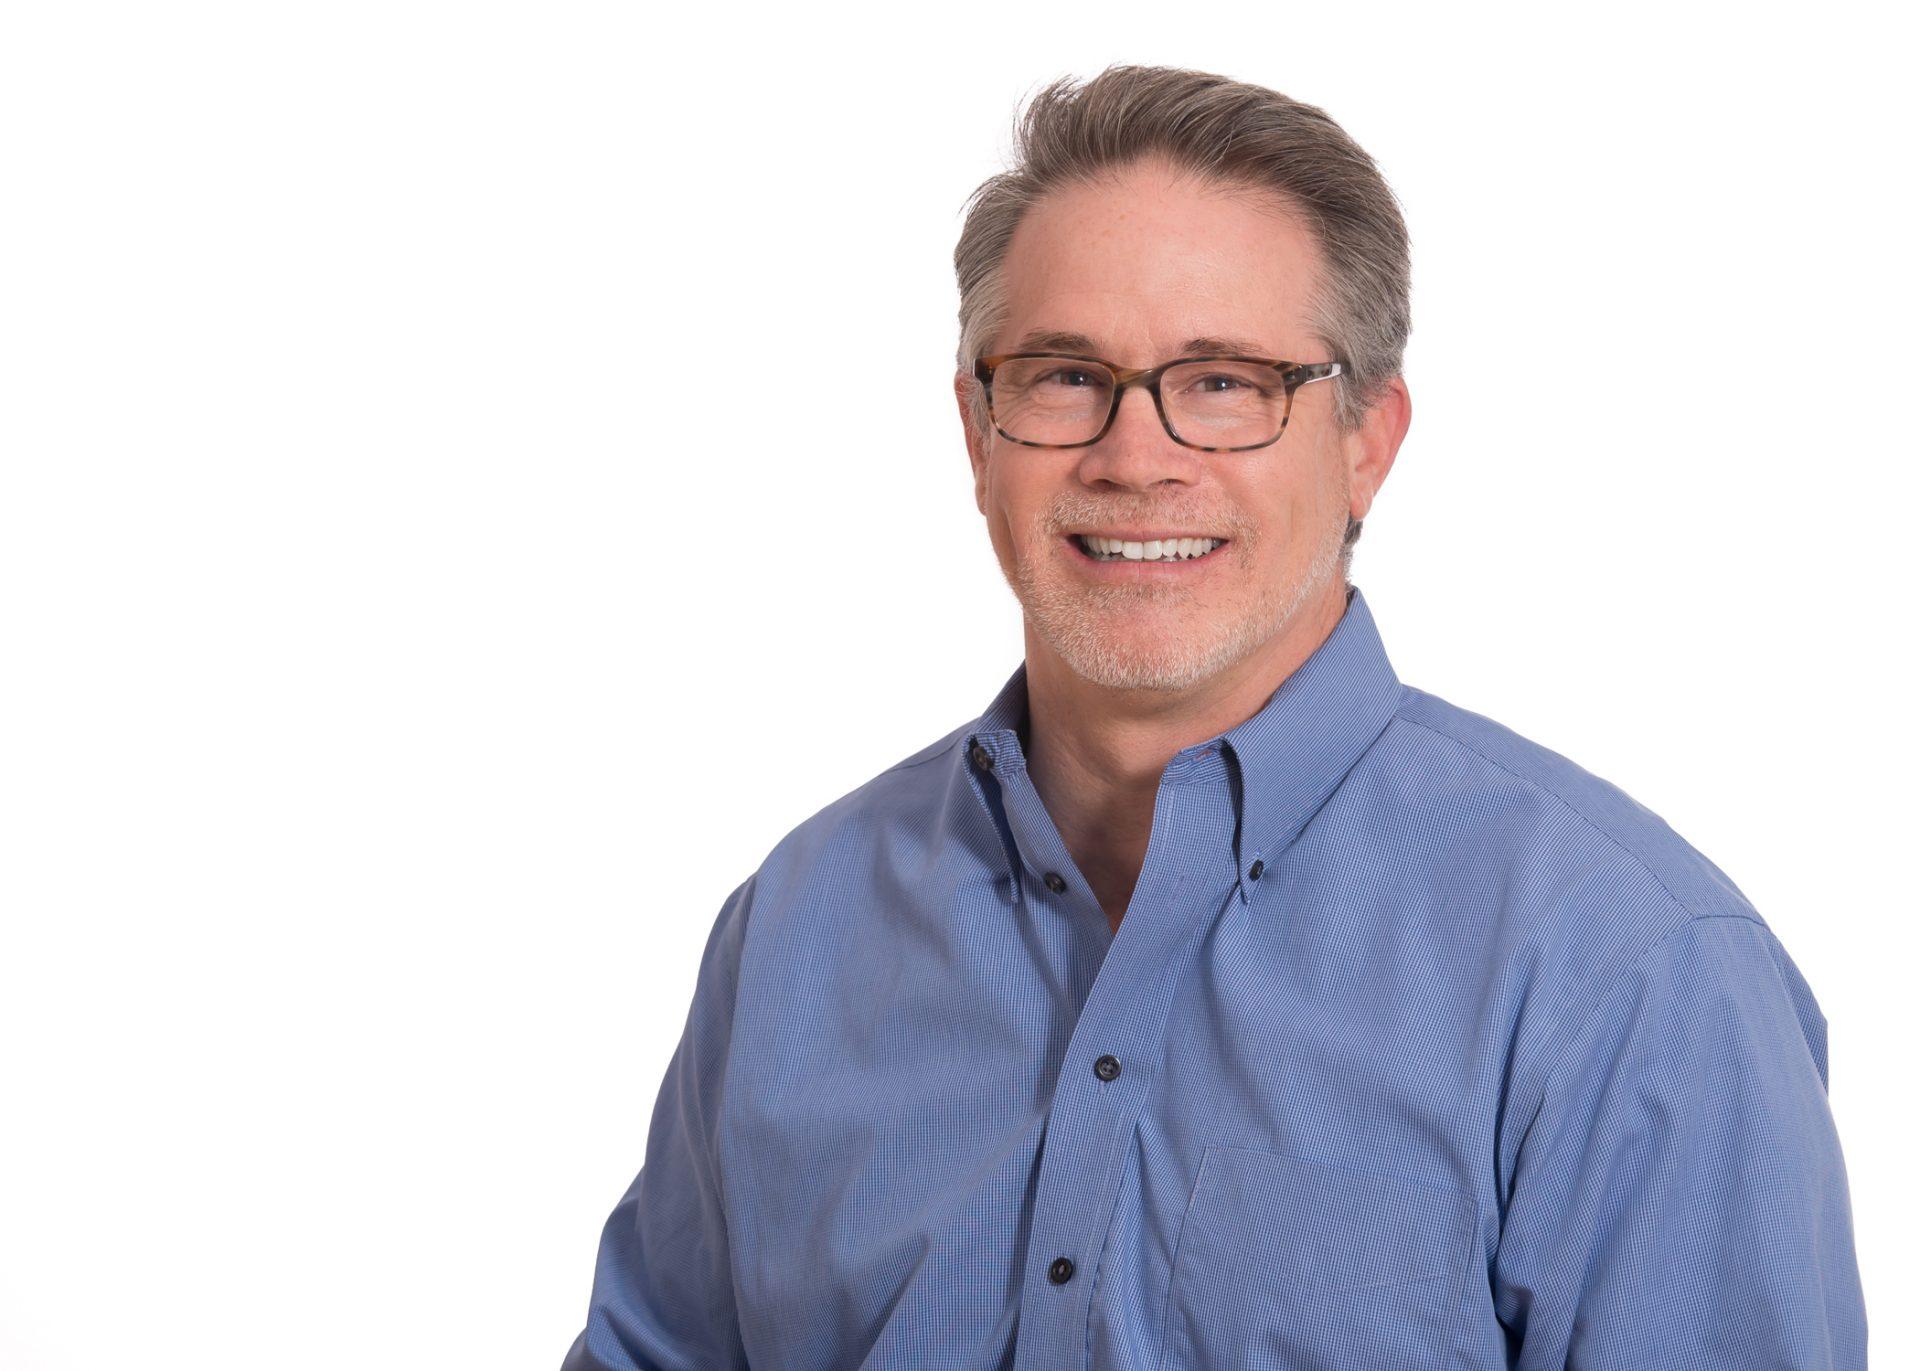 jim dunn headshot president of aquatic development group